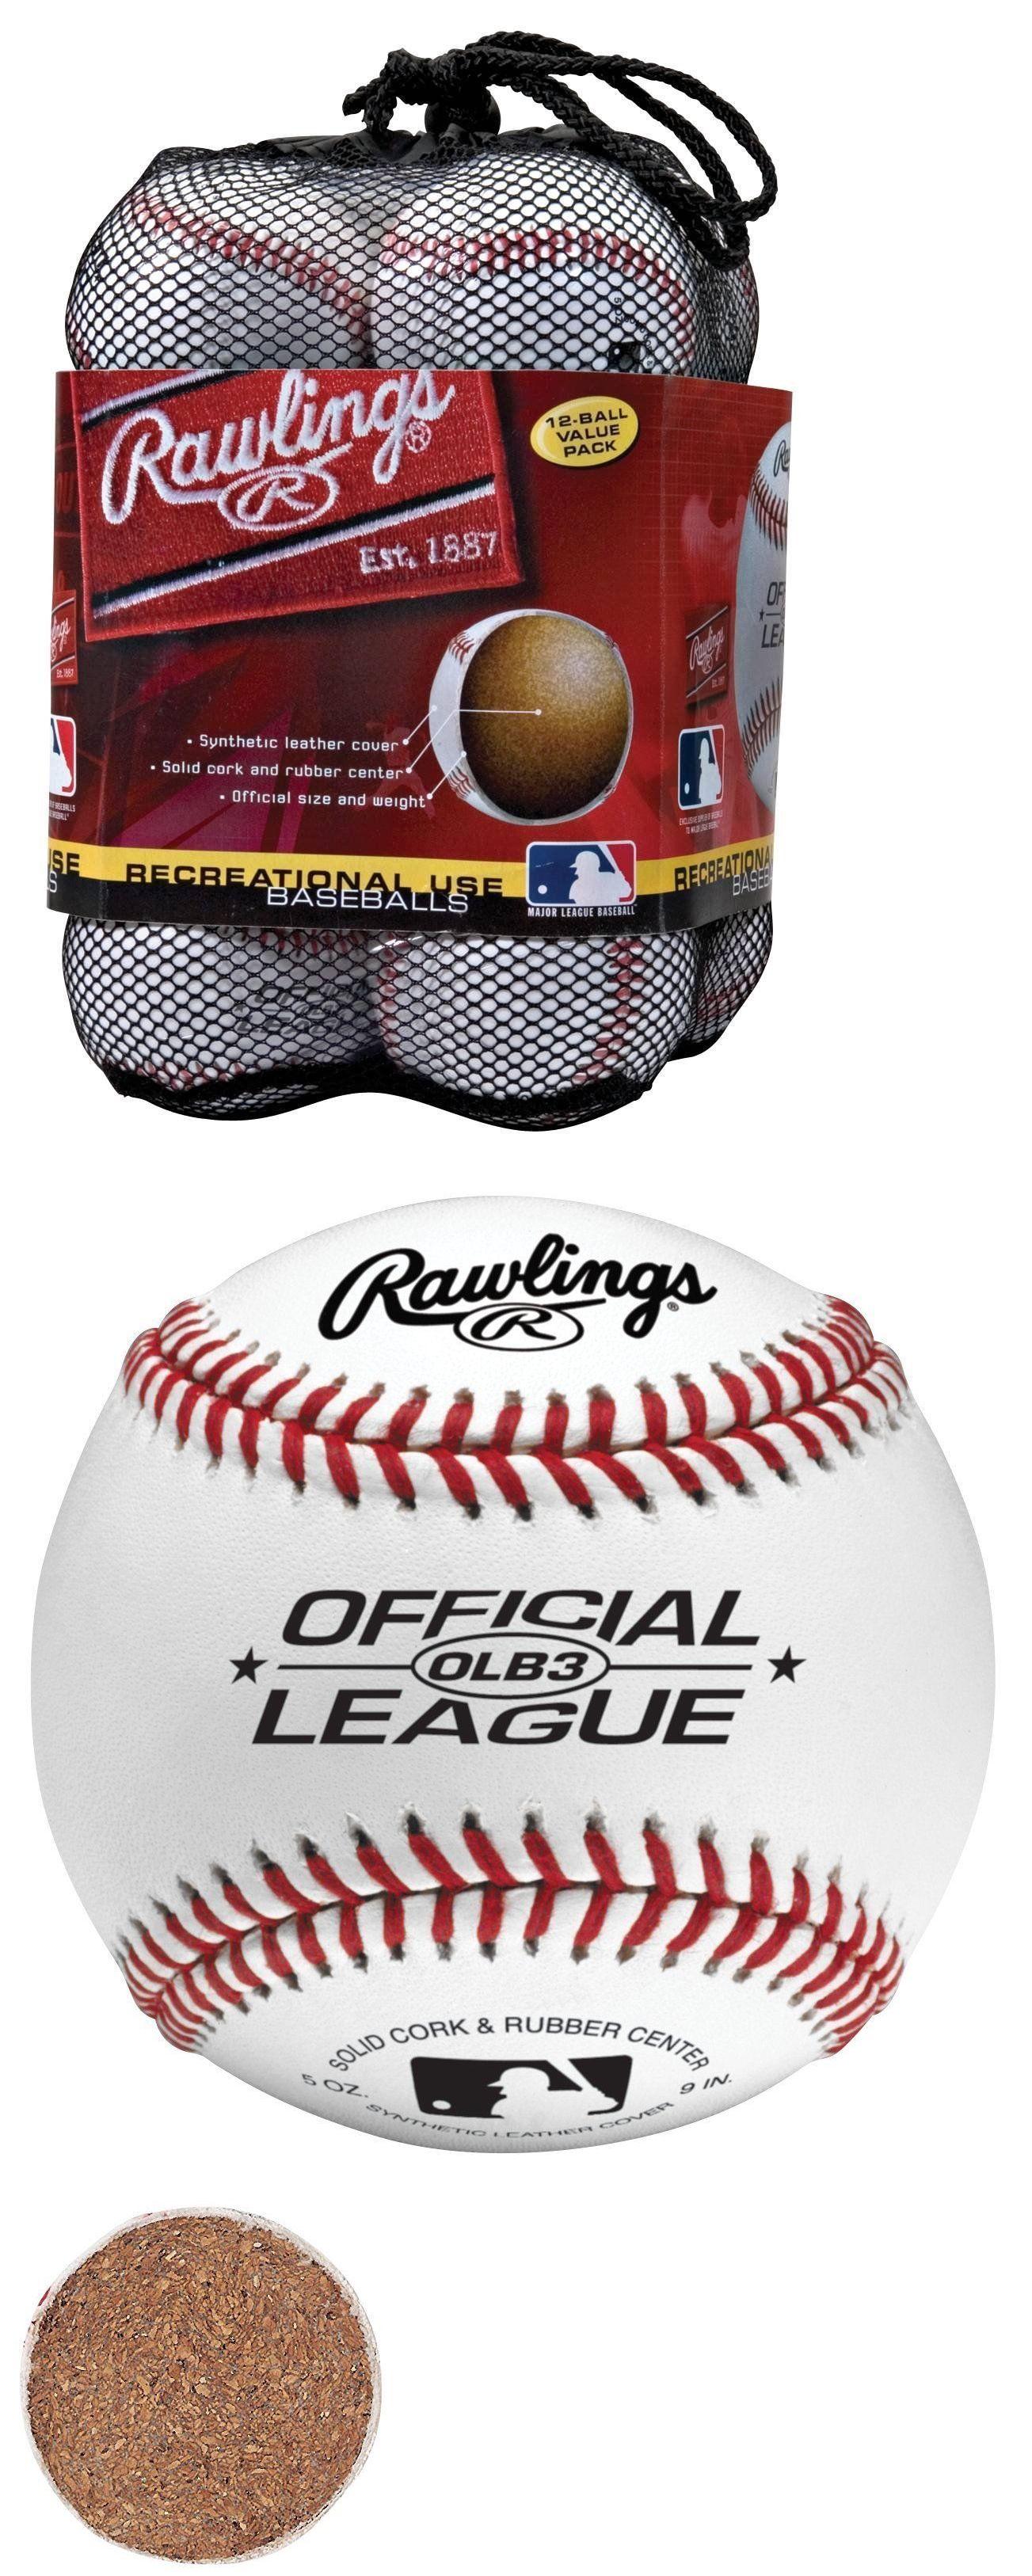 26dc3b0f Baseballs 73893: Rawlings Official League Recreational Use Baseballs, Bag  Of 12, Olb3bag12 -> BUY IT NOW ONLY: $23.9 on #eBay #baseballs #rawlings # official ...